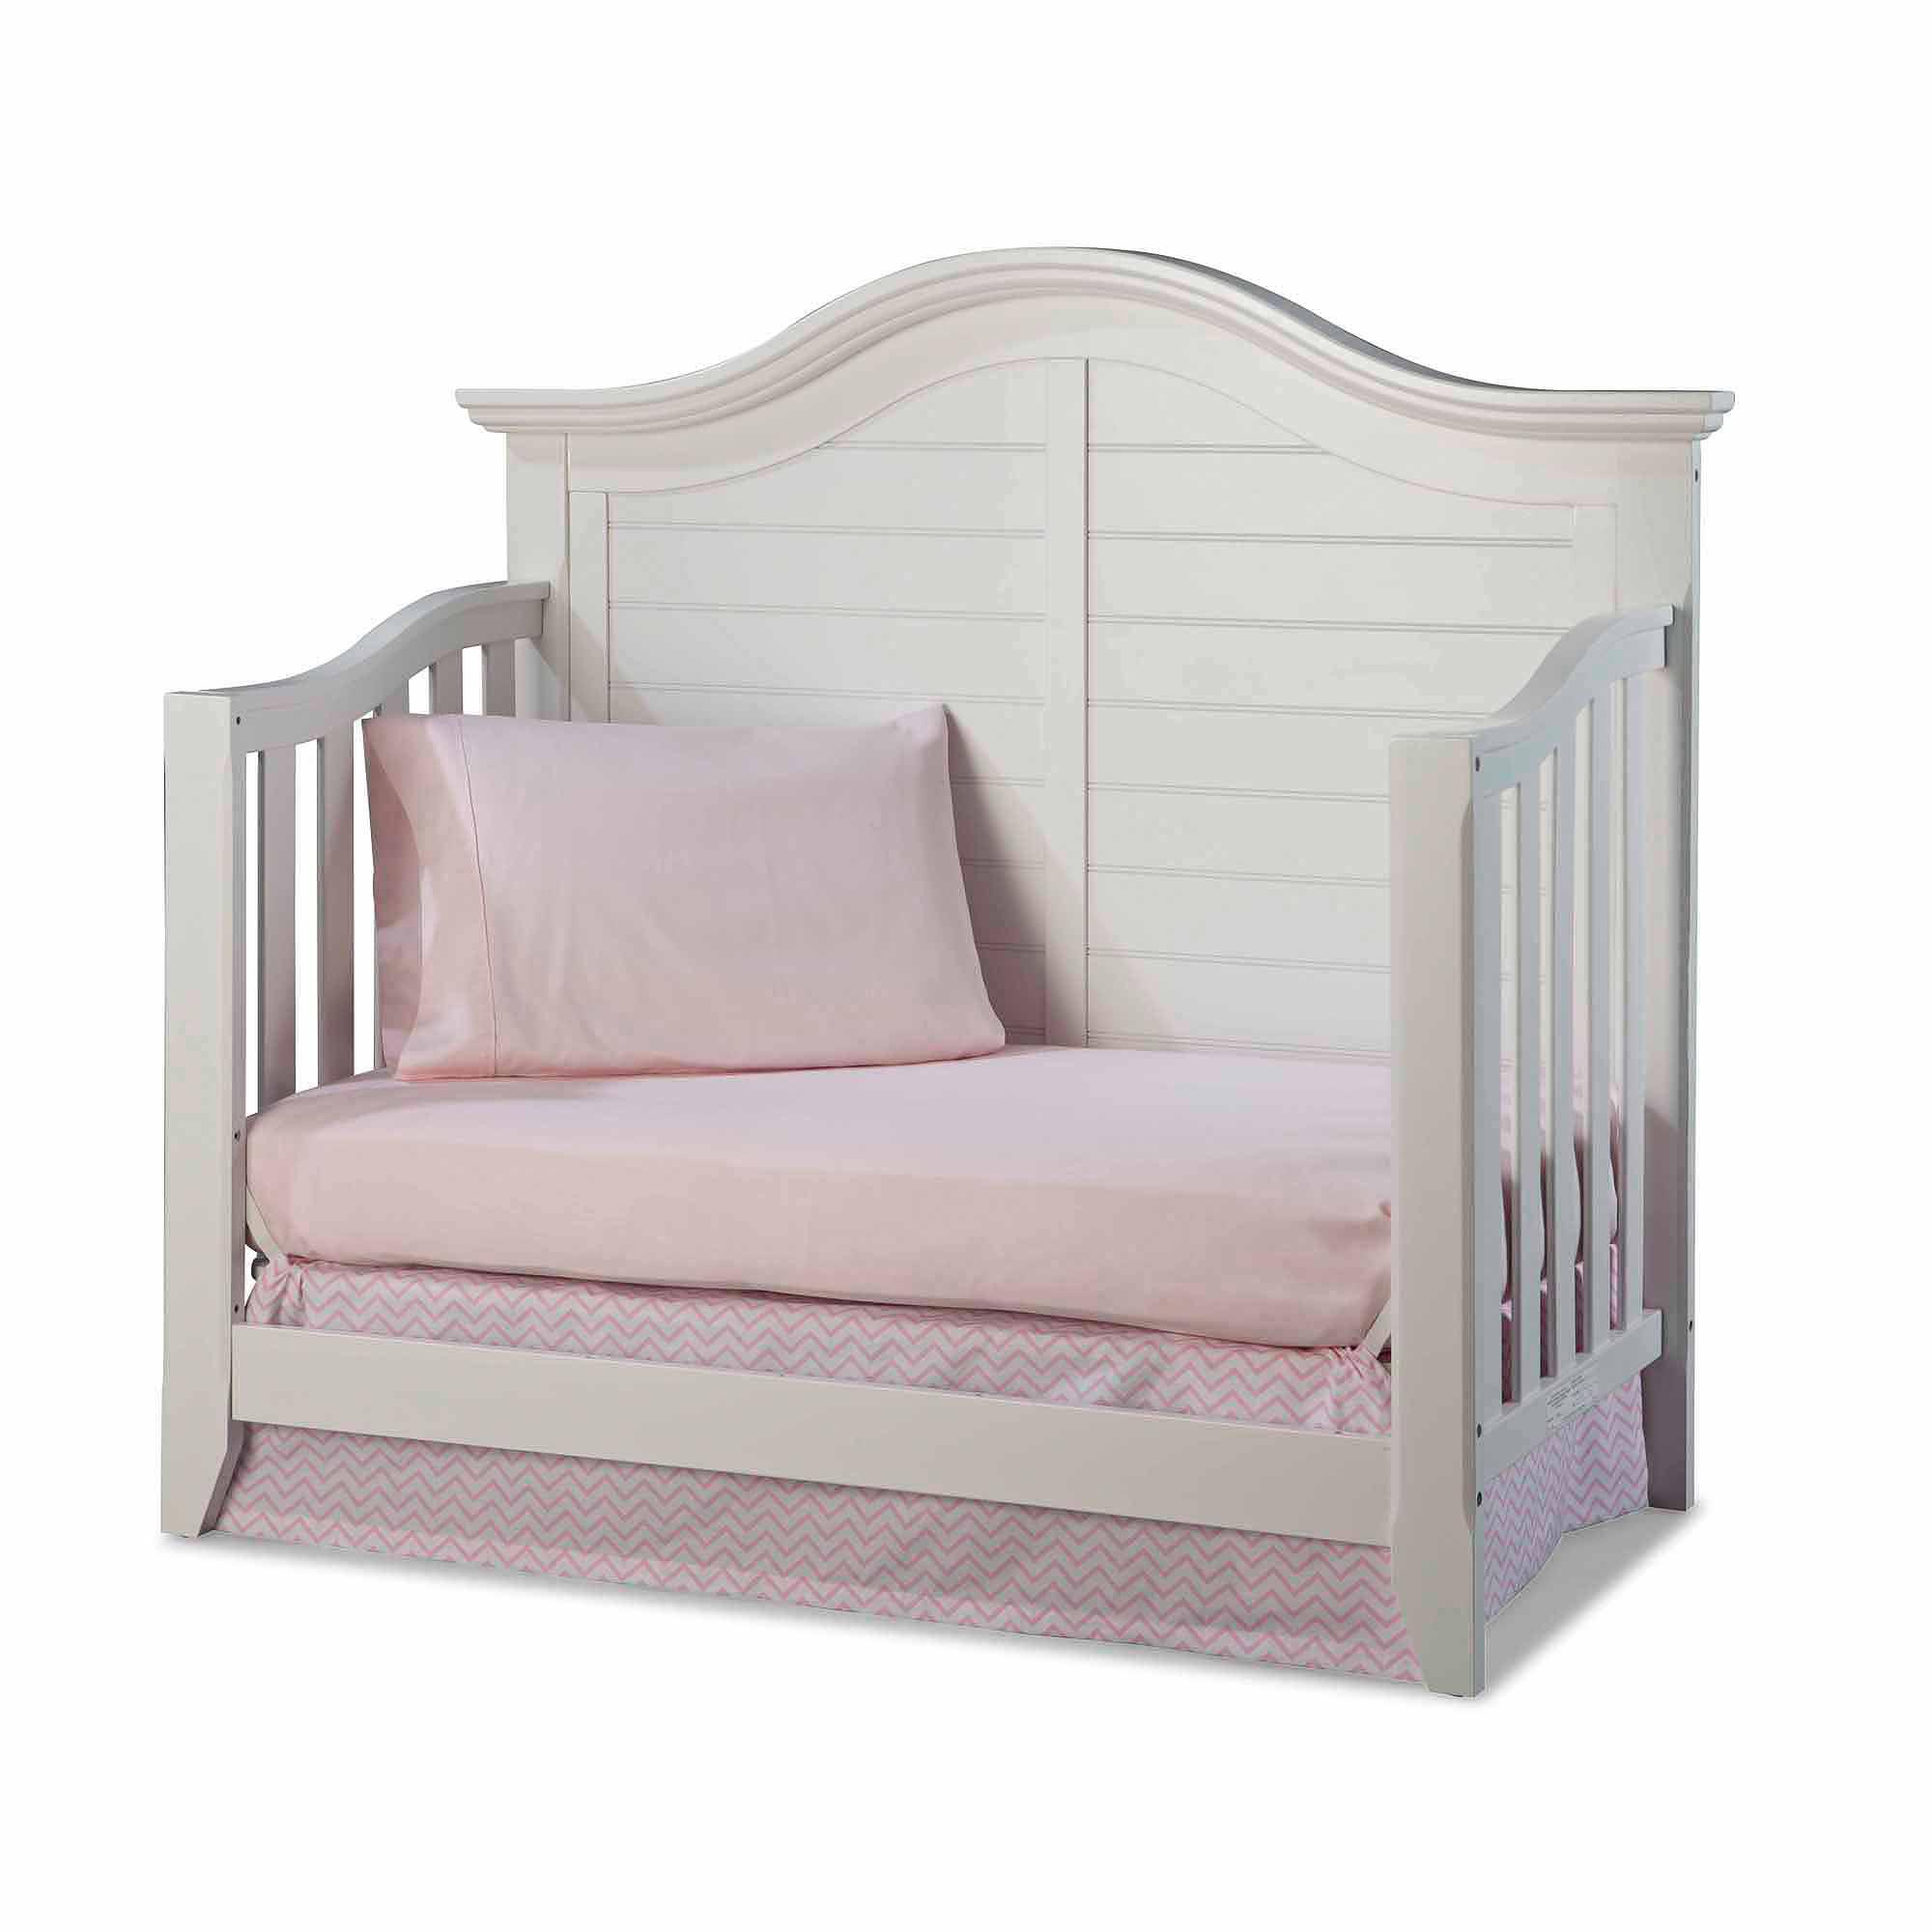 Charming Thomasville Kids Southern Dunes Lifestyle 4 In 1 Convertible Crib White    Walmart.com